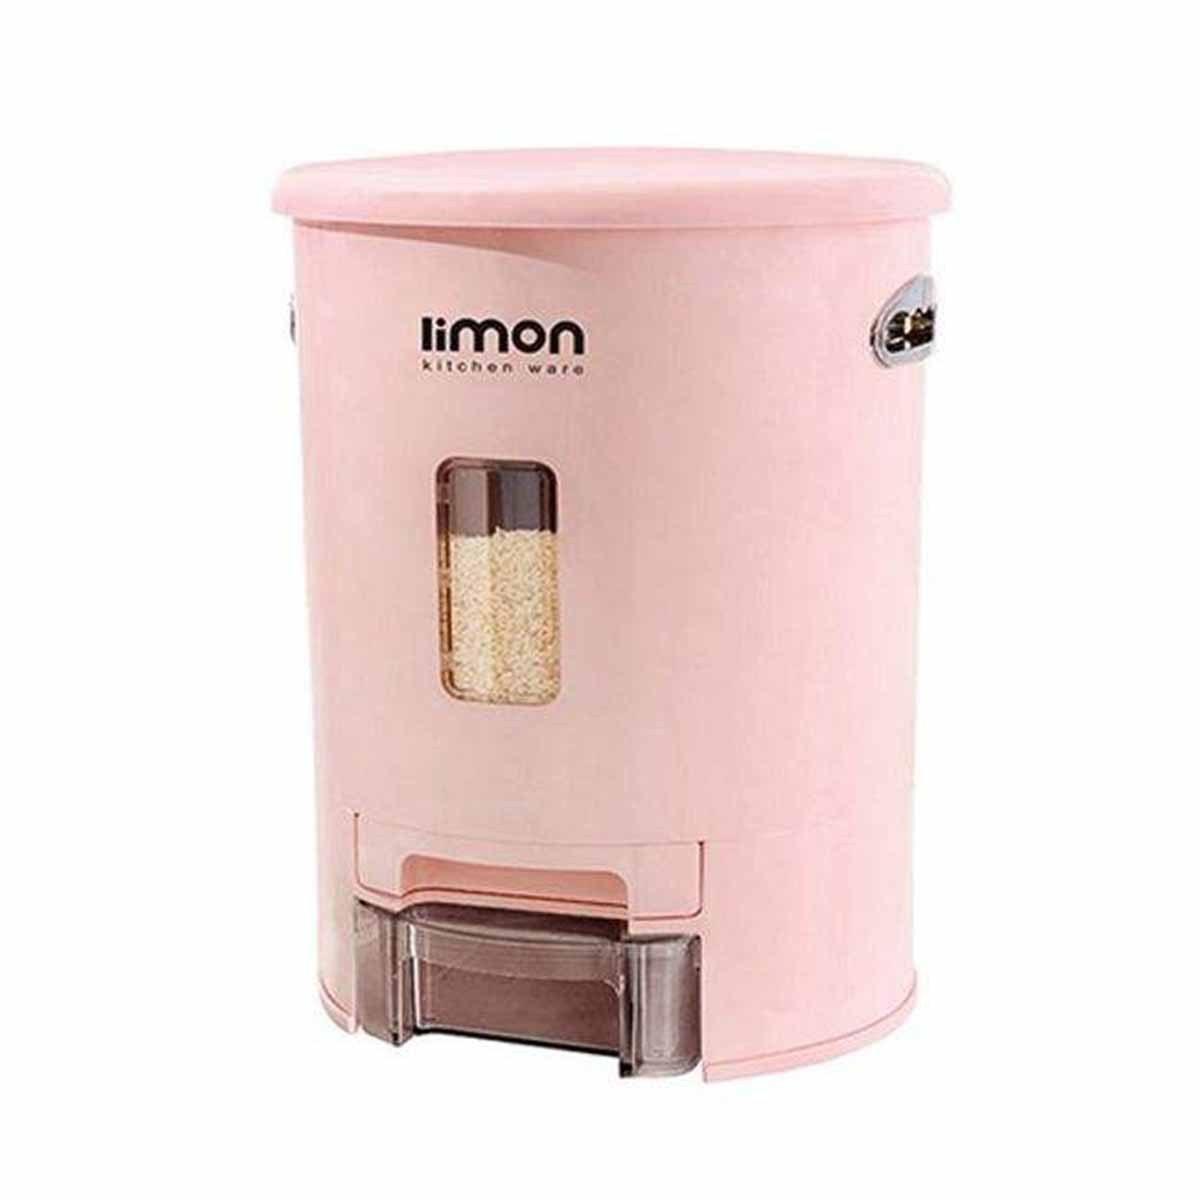 تصویر ظرف برنج لیمون گنجایش 14 کیلوگرم